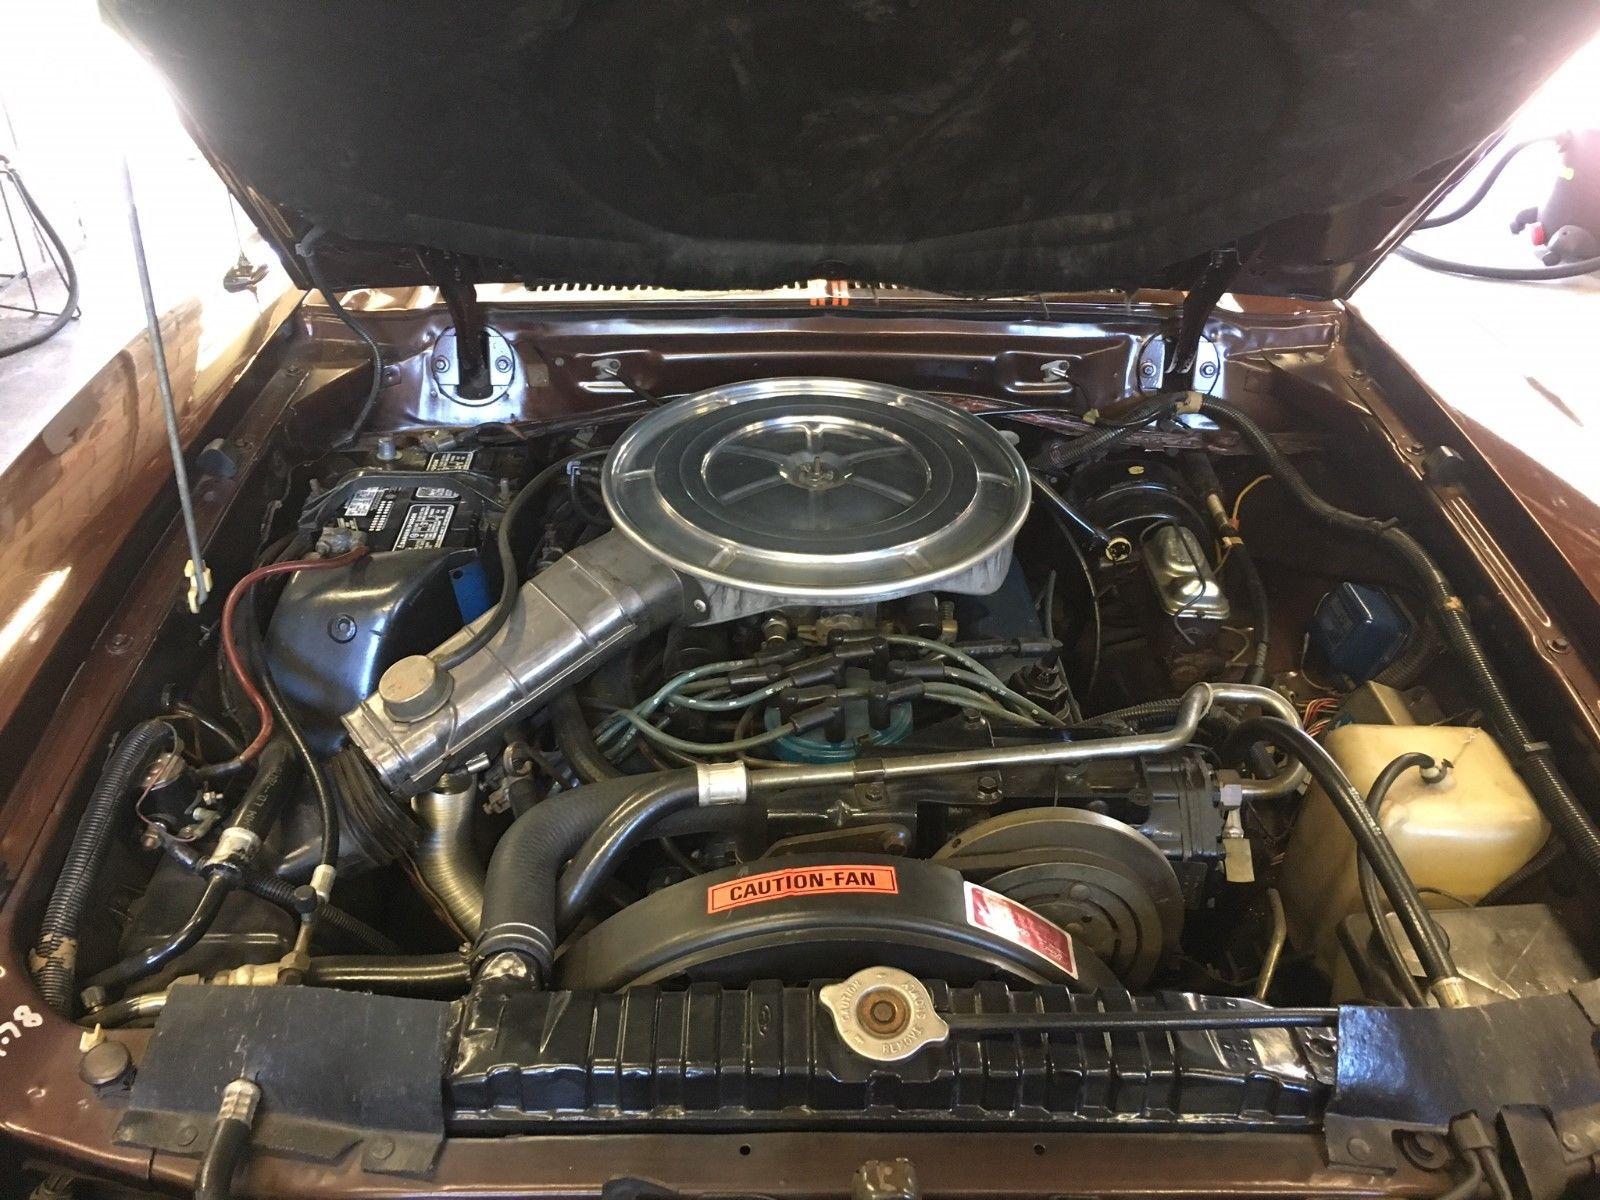 1978 Ford Mustang II King Cobra engine